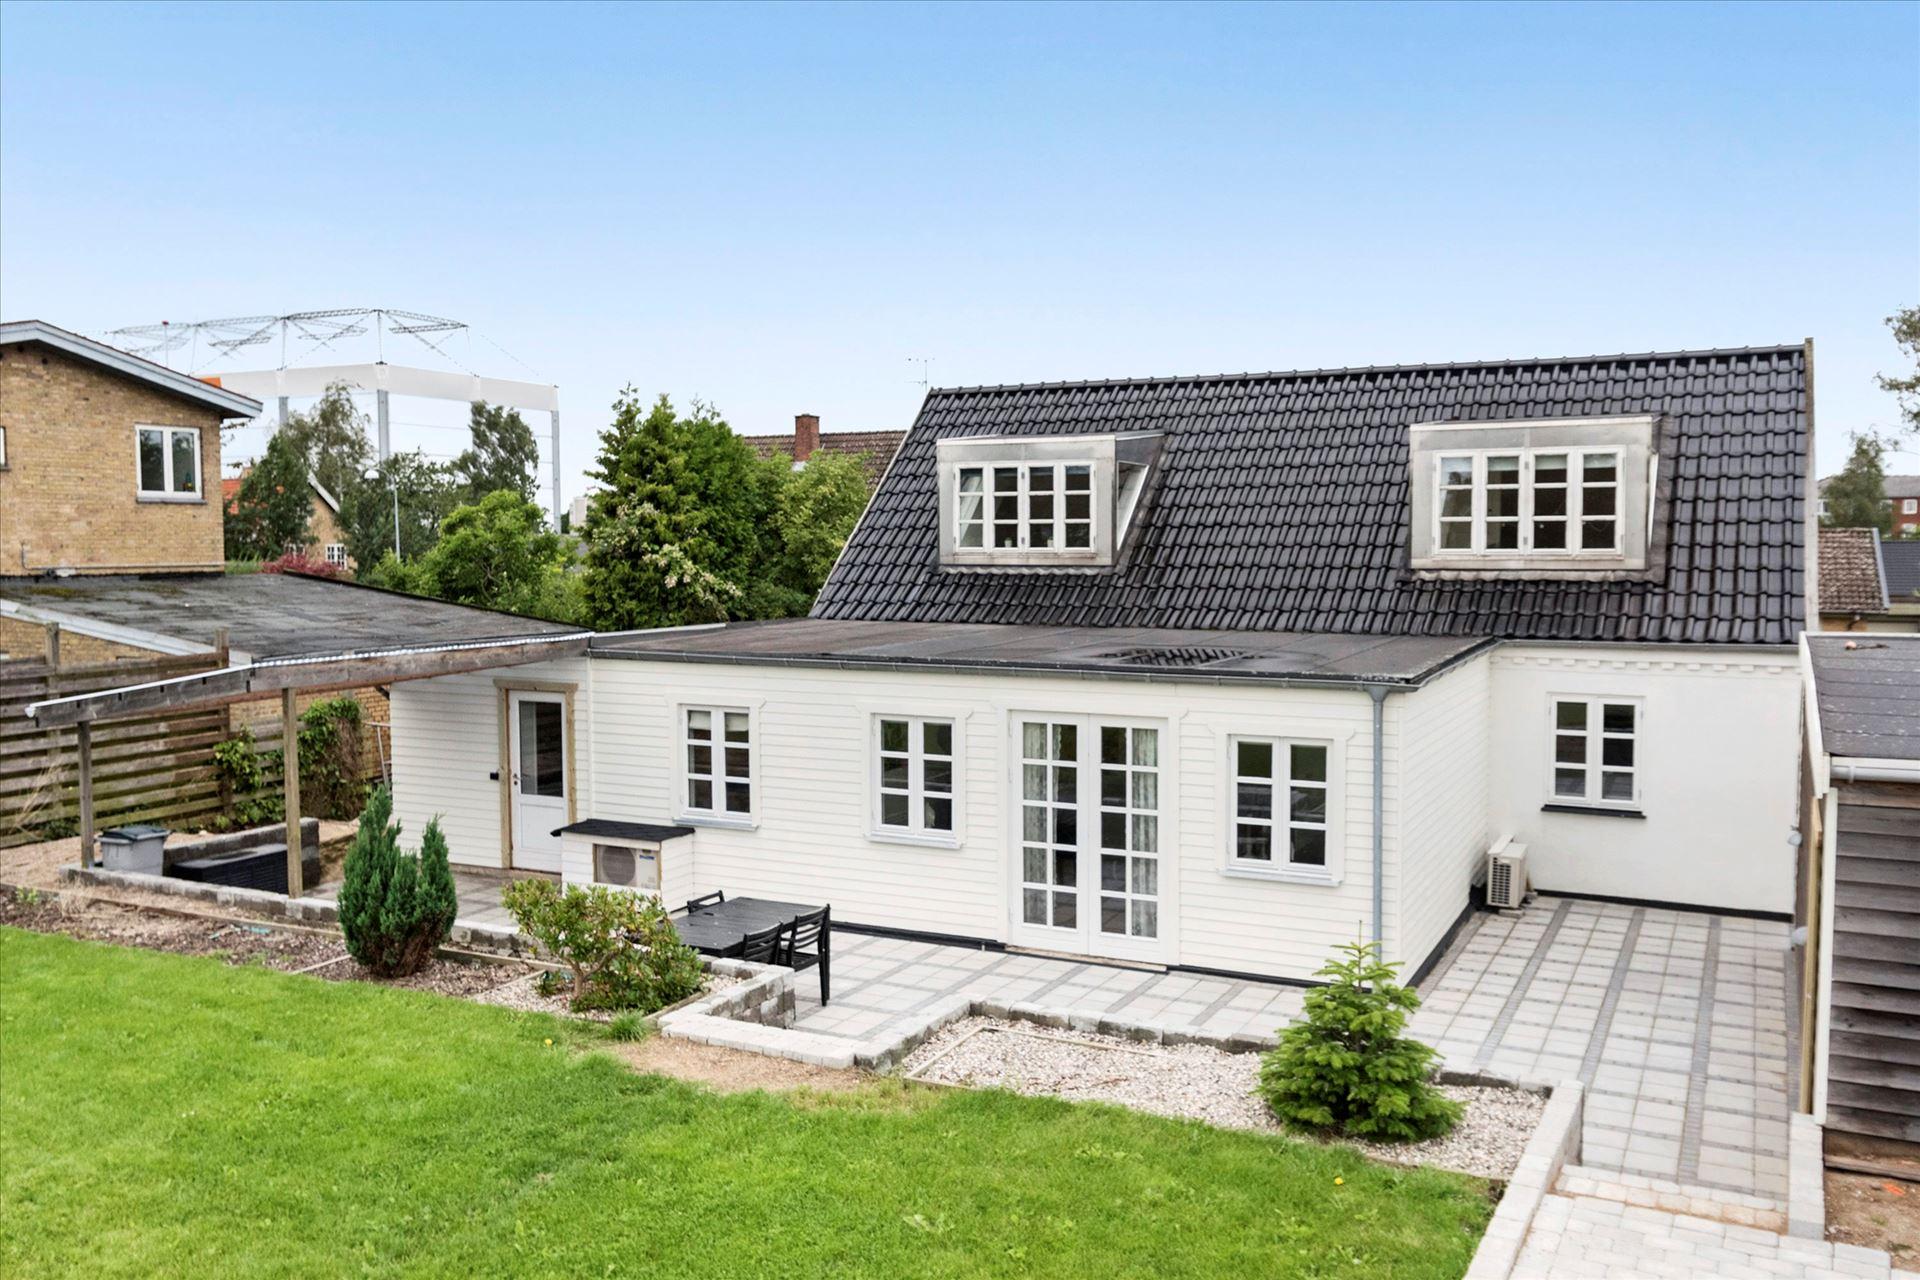 Villa til Salg - Roasvej 11, 2750 Ballerup